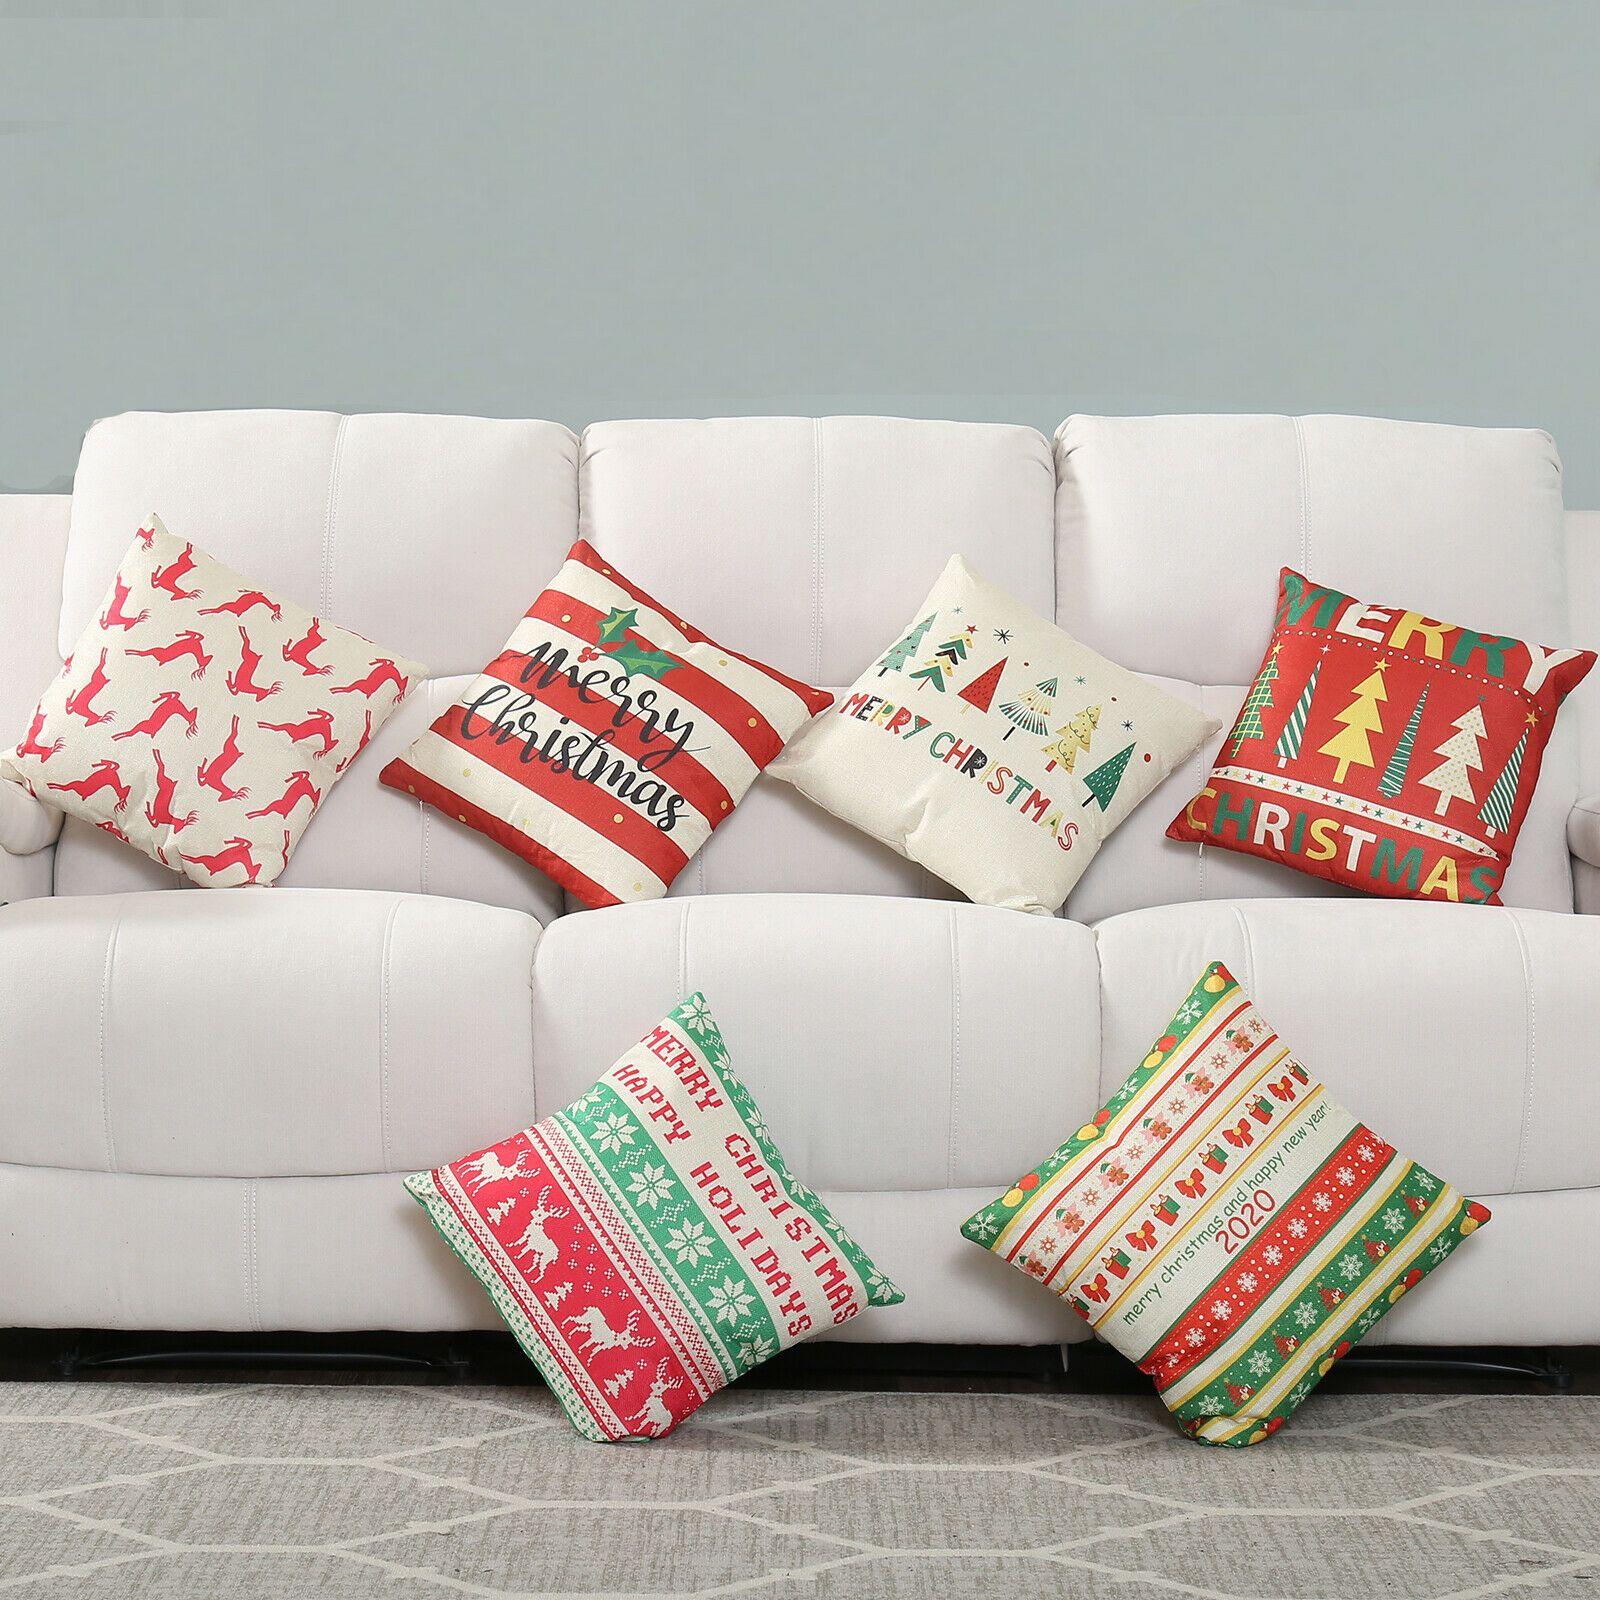 Christmas Pillow Case Sofa Car Throw Cushion Covers Home Decor Holiday Gift New Sofa Cushions Idea Cushions For Sale Cushions On Sofa Christmas Pillowcases